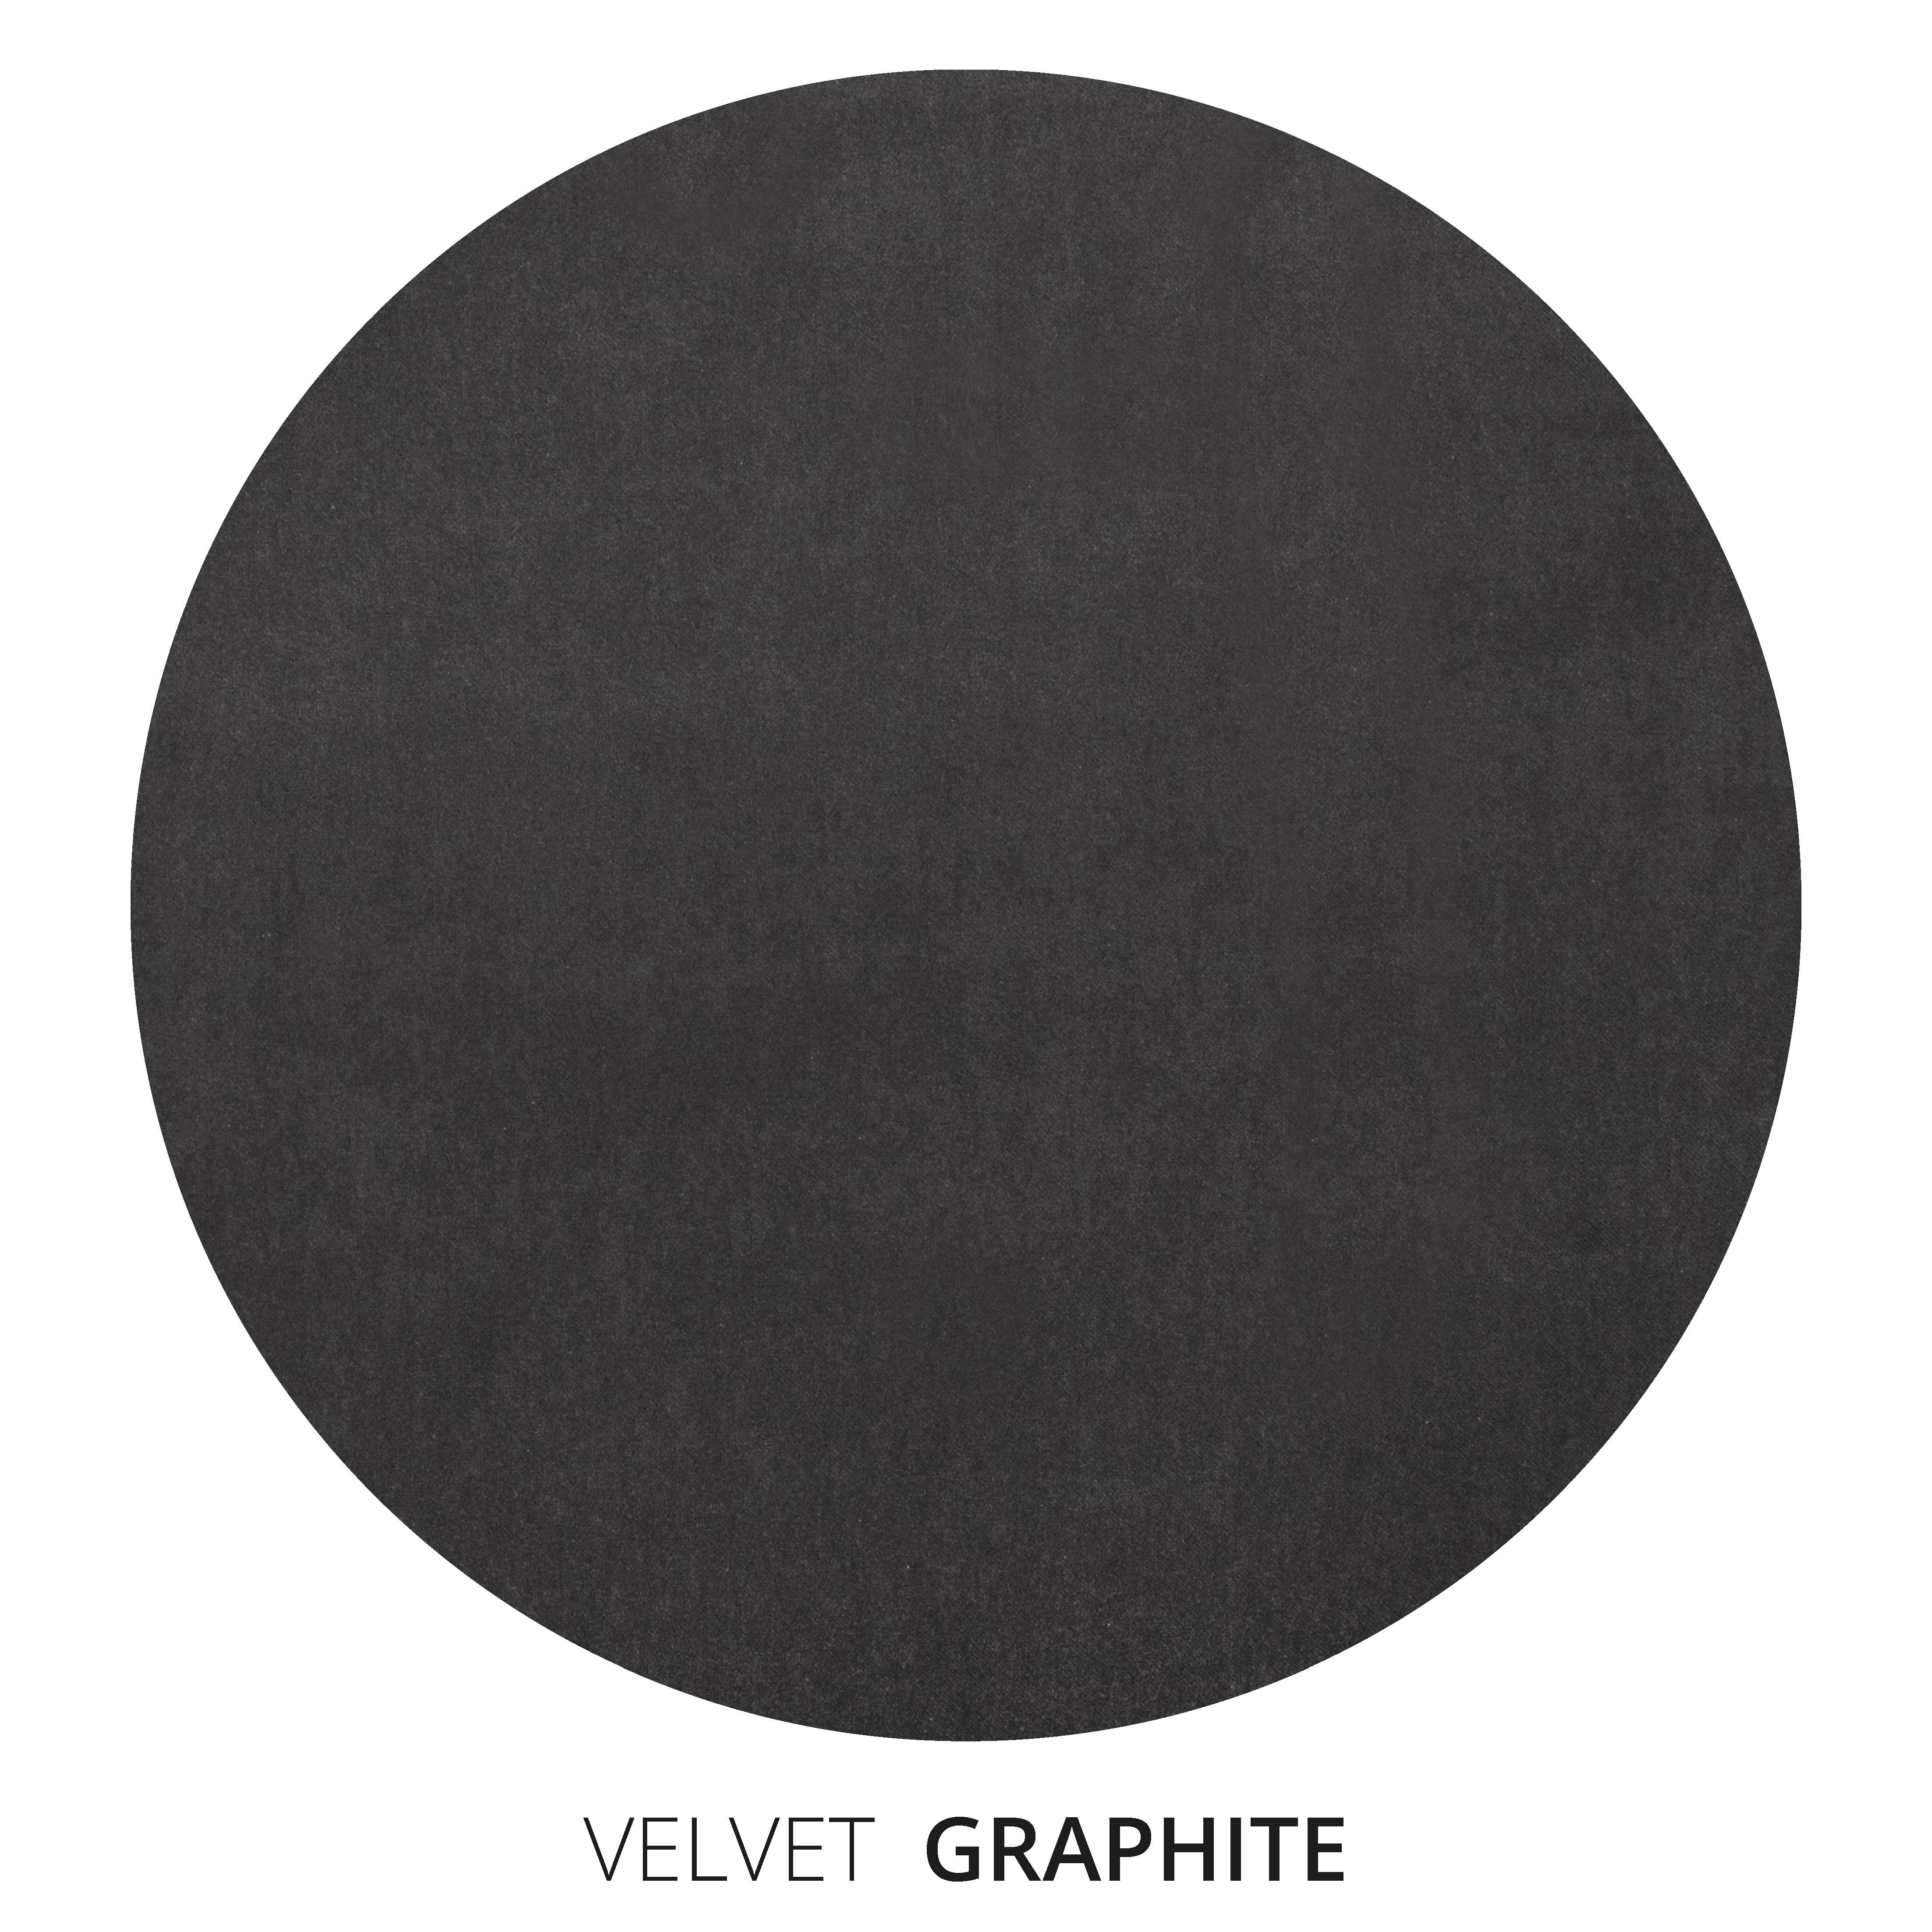 Graphite Velvet Swatch